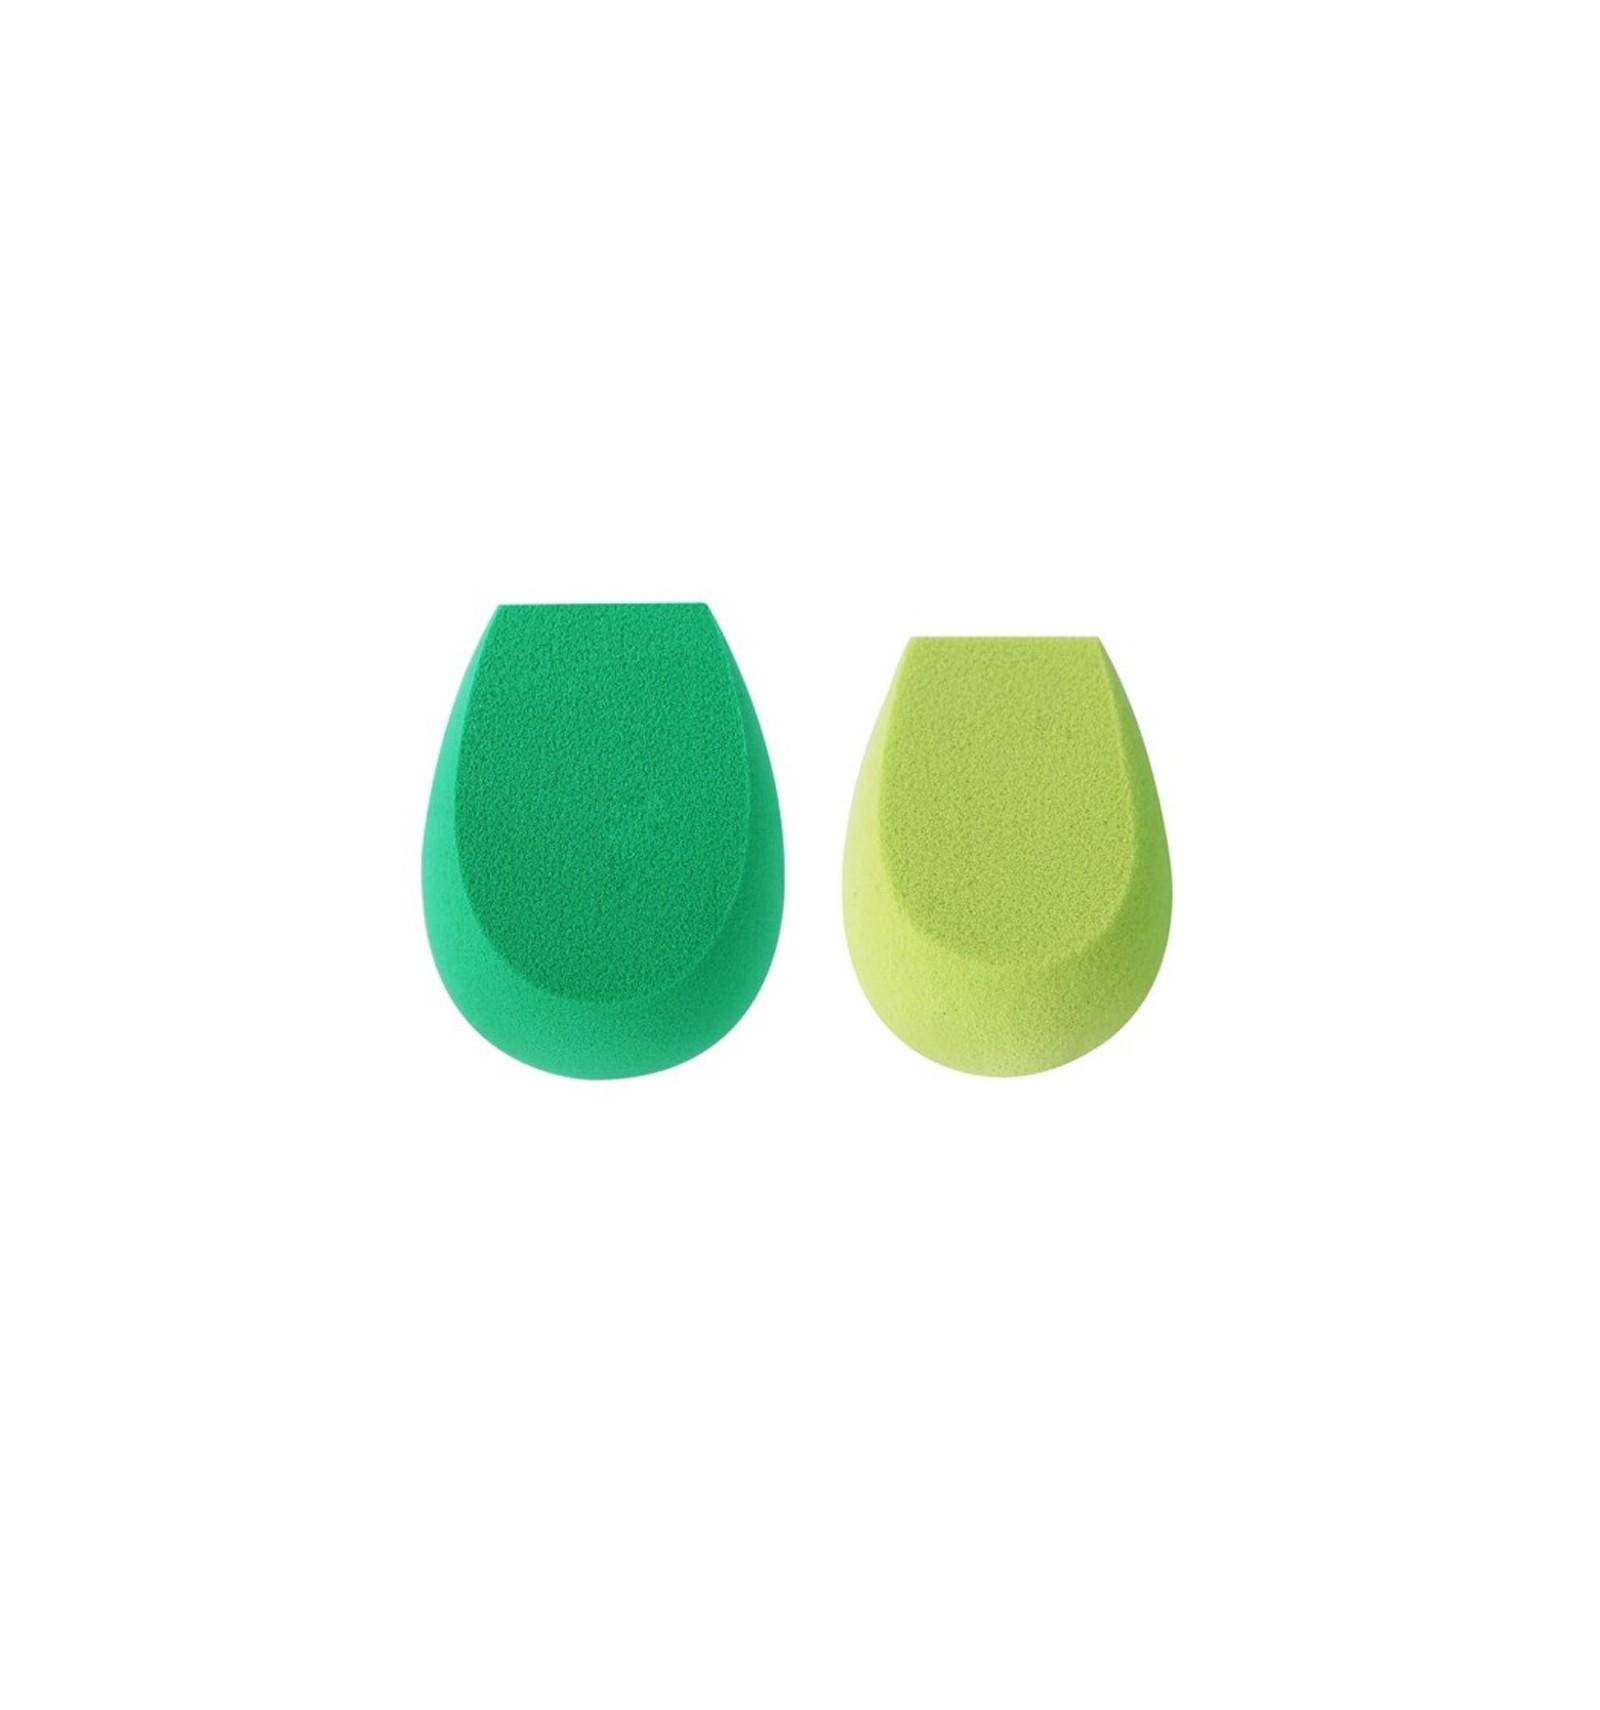 Ecotools Perfecting Blender Duo Eco Tools 1616 Sponge